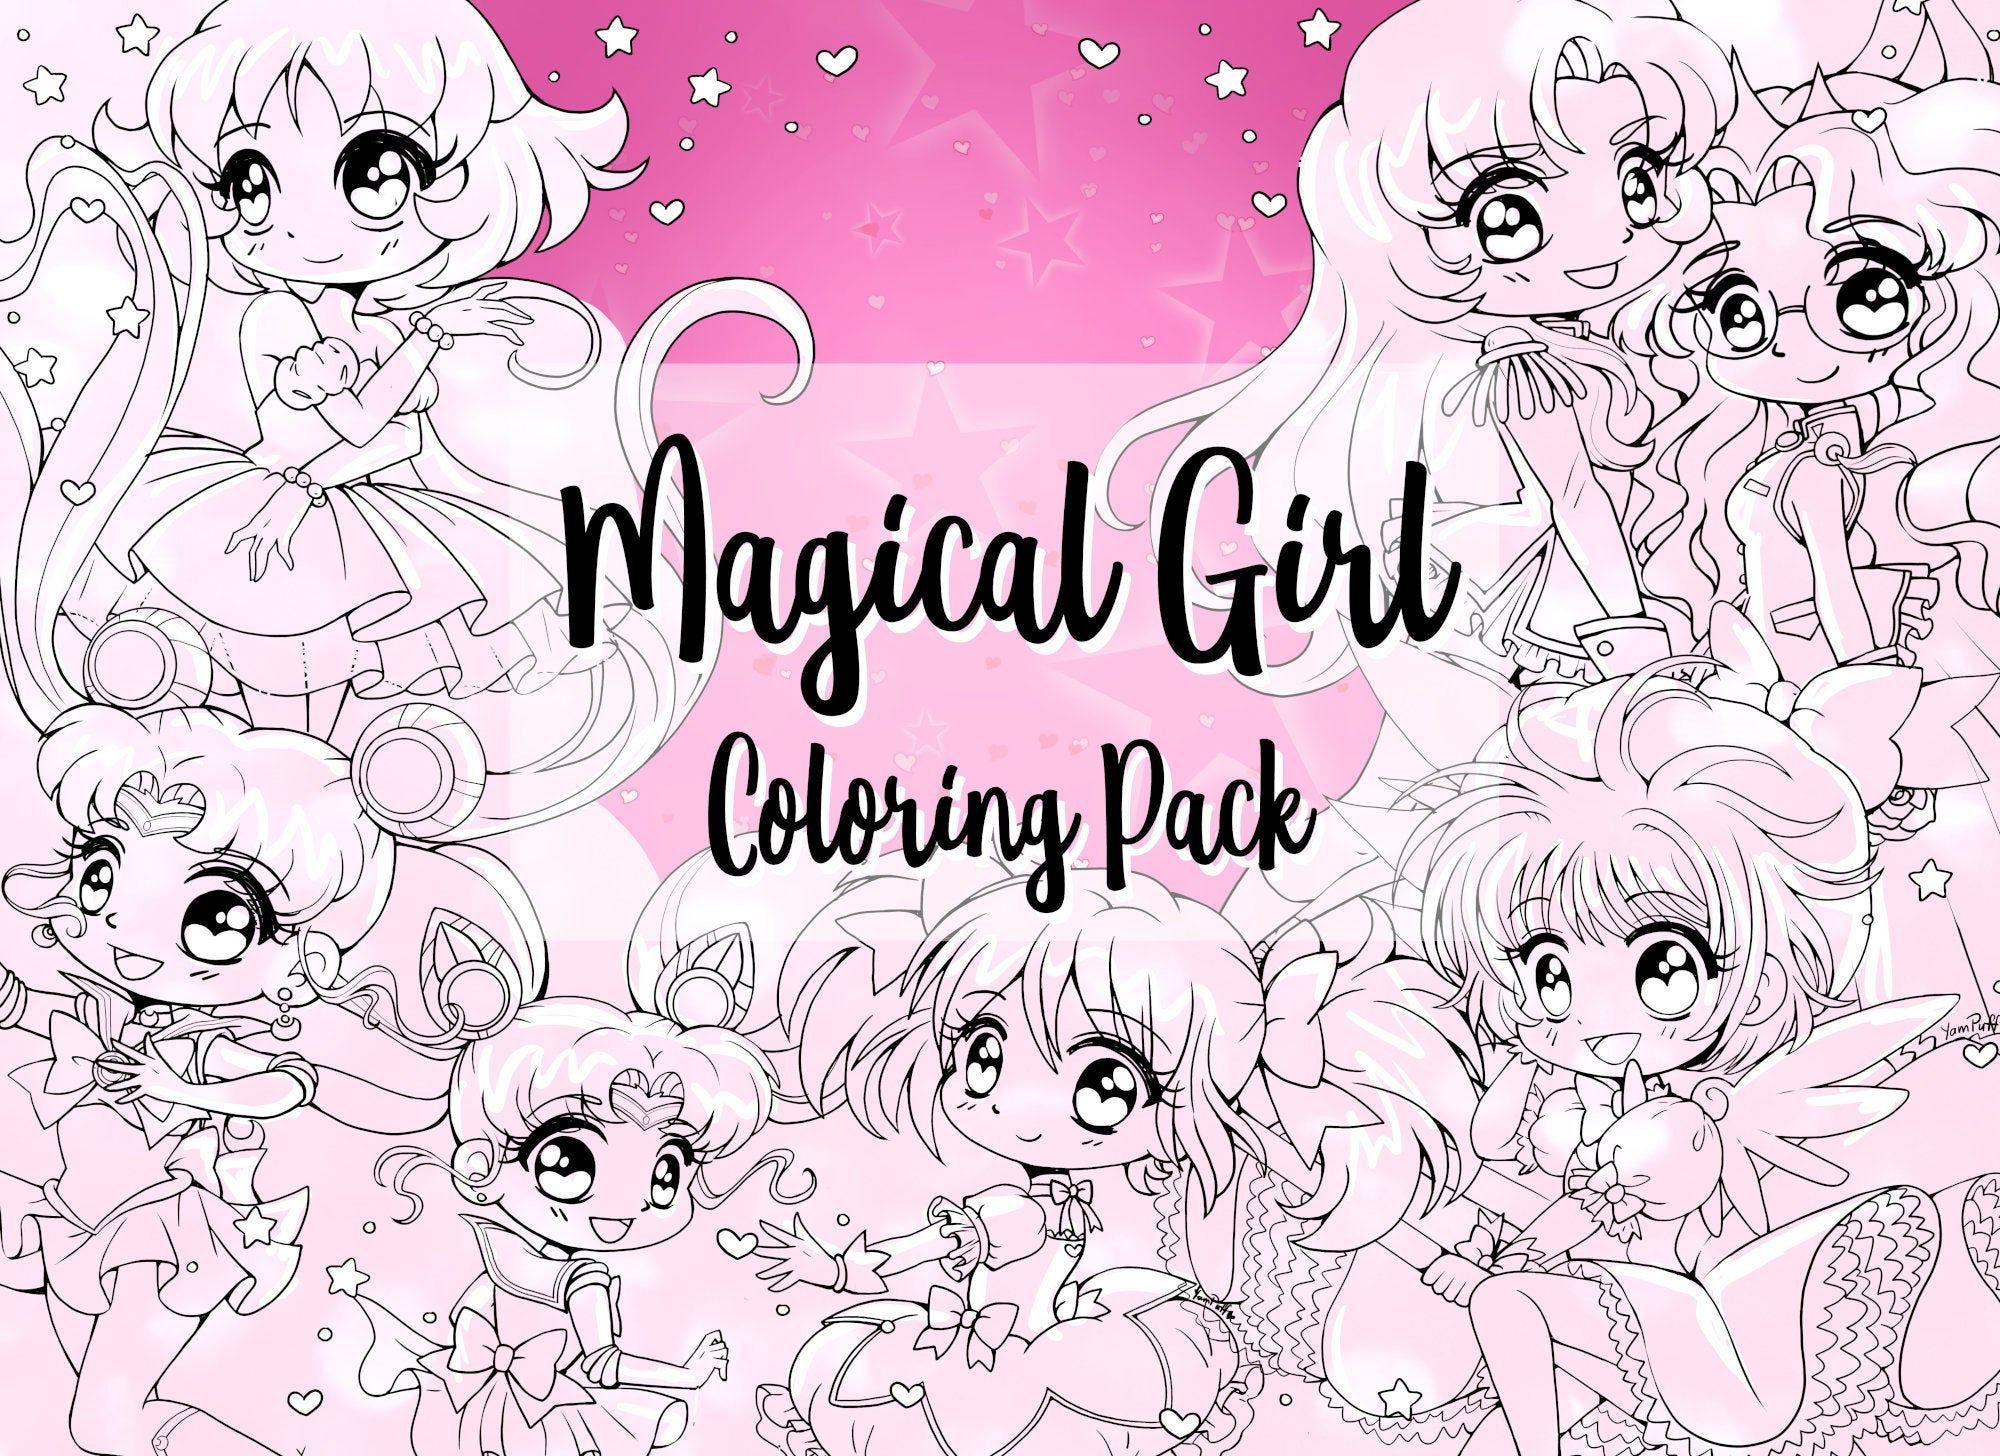 Magical Girl Digital Coloring Pack By Yampuff Sailor Moon Etsy Magical Girl Cardcaptor Sakura Chibi Coloring Pages